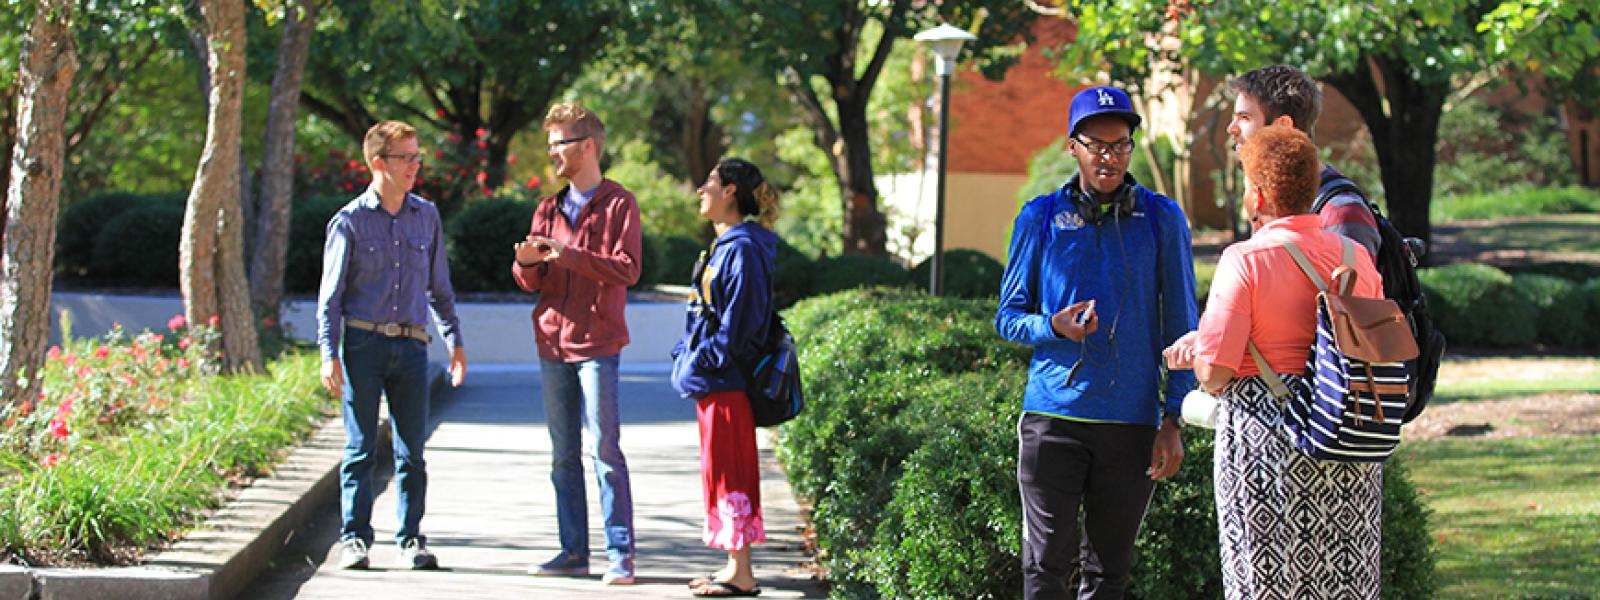 CIU students build lasting friendships.